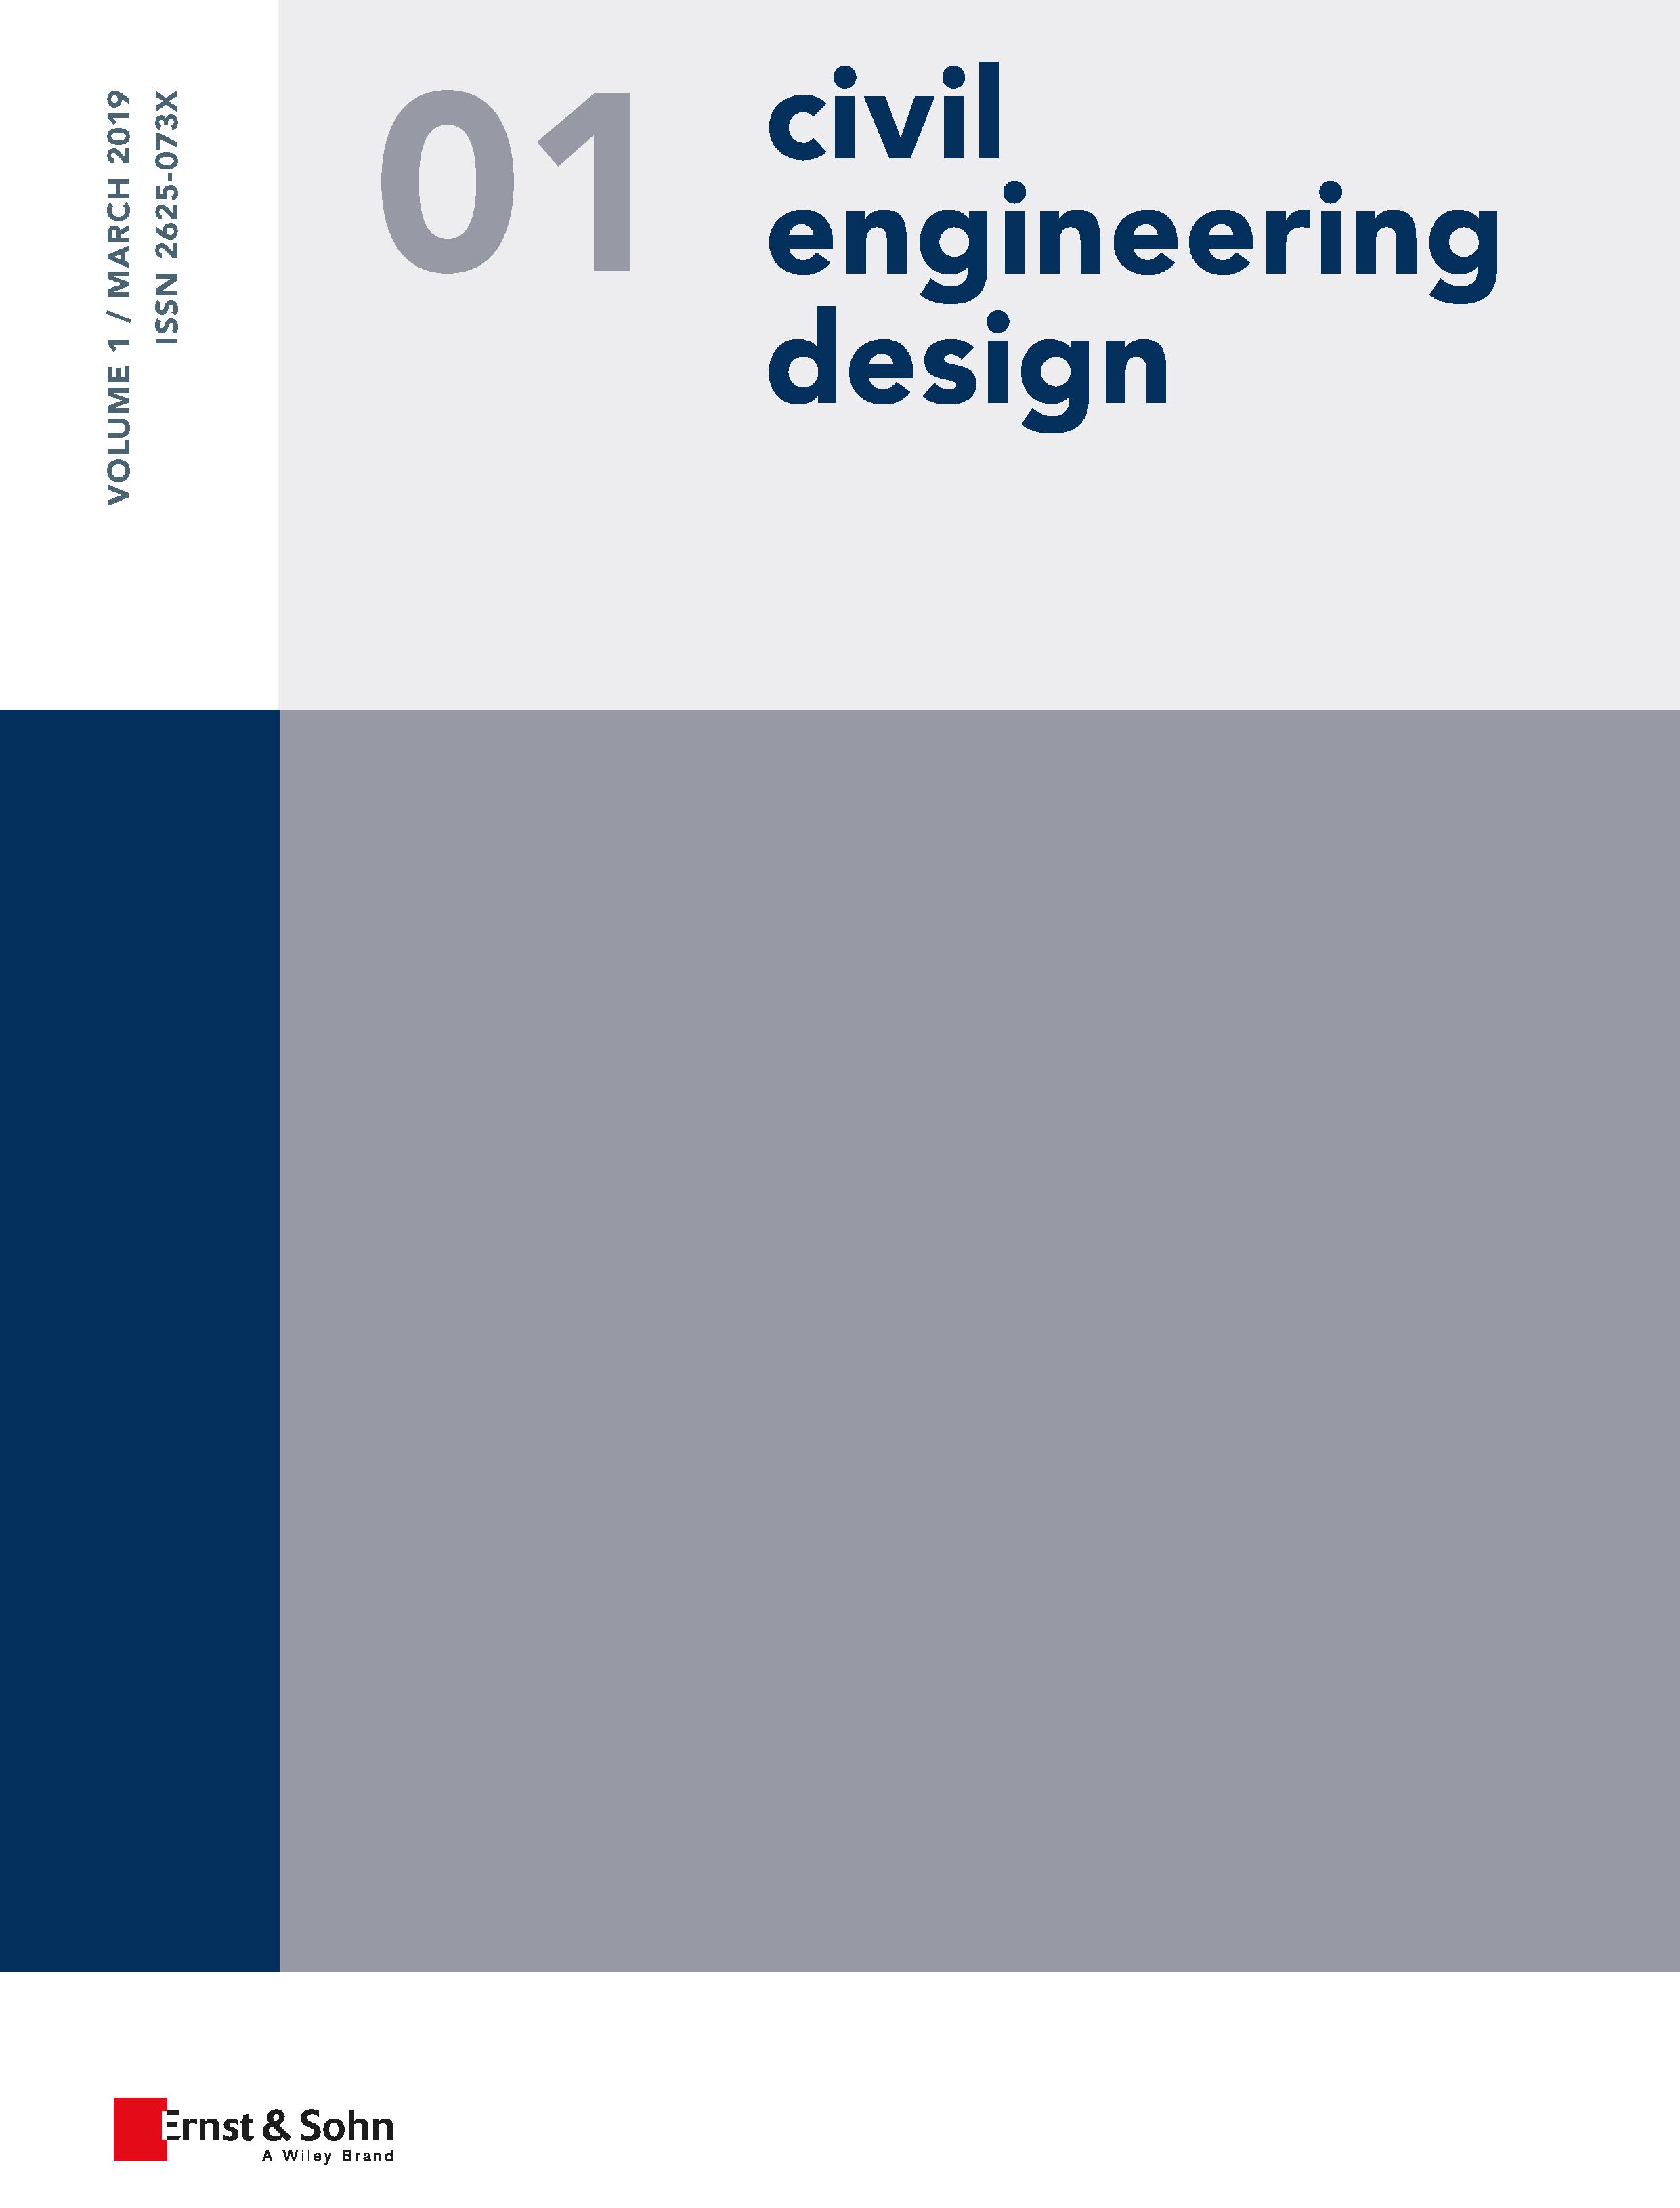 Civil Engineering Design Volume 1 / March 2019